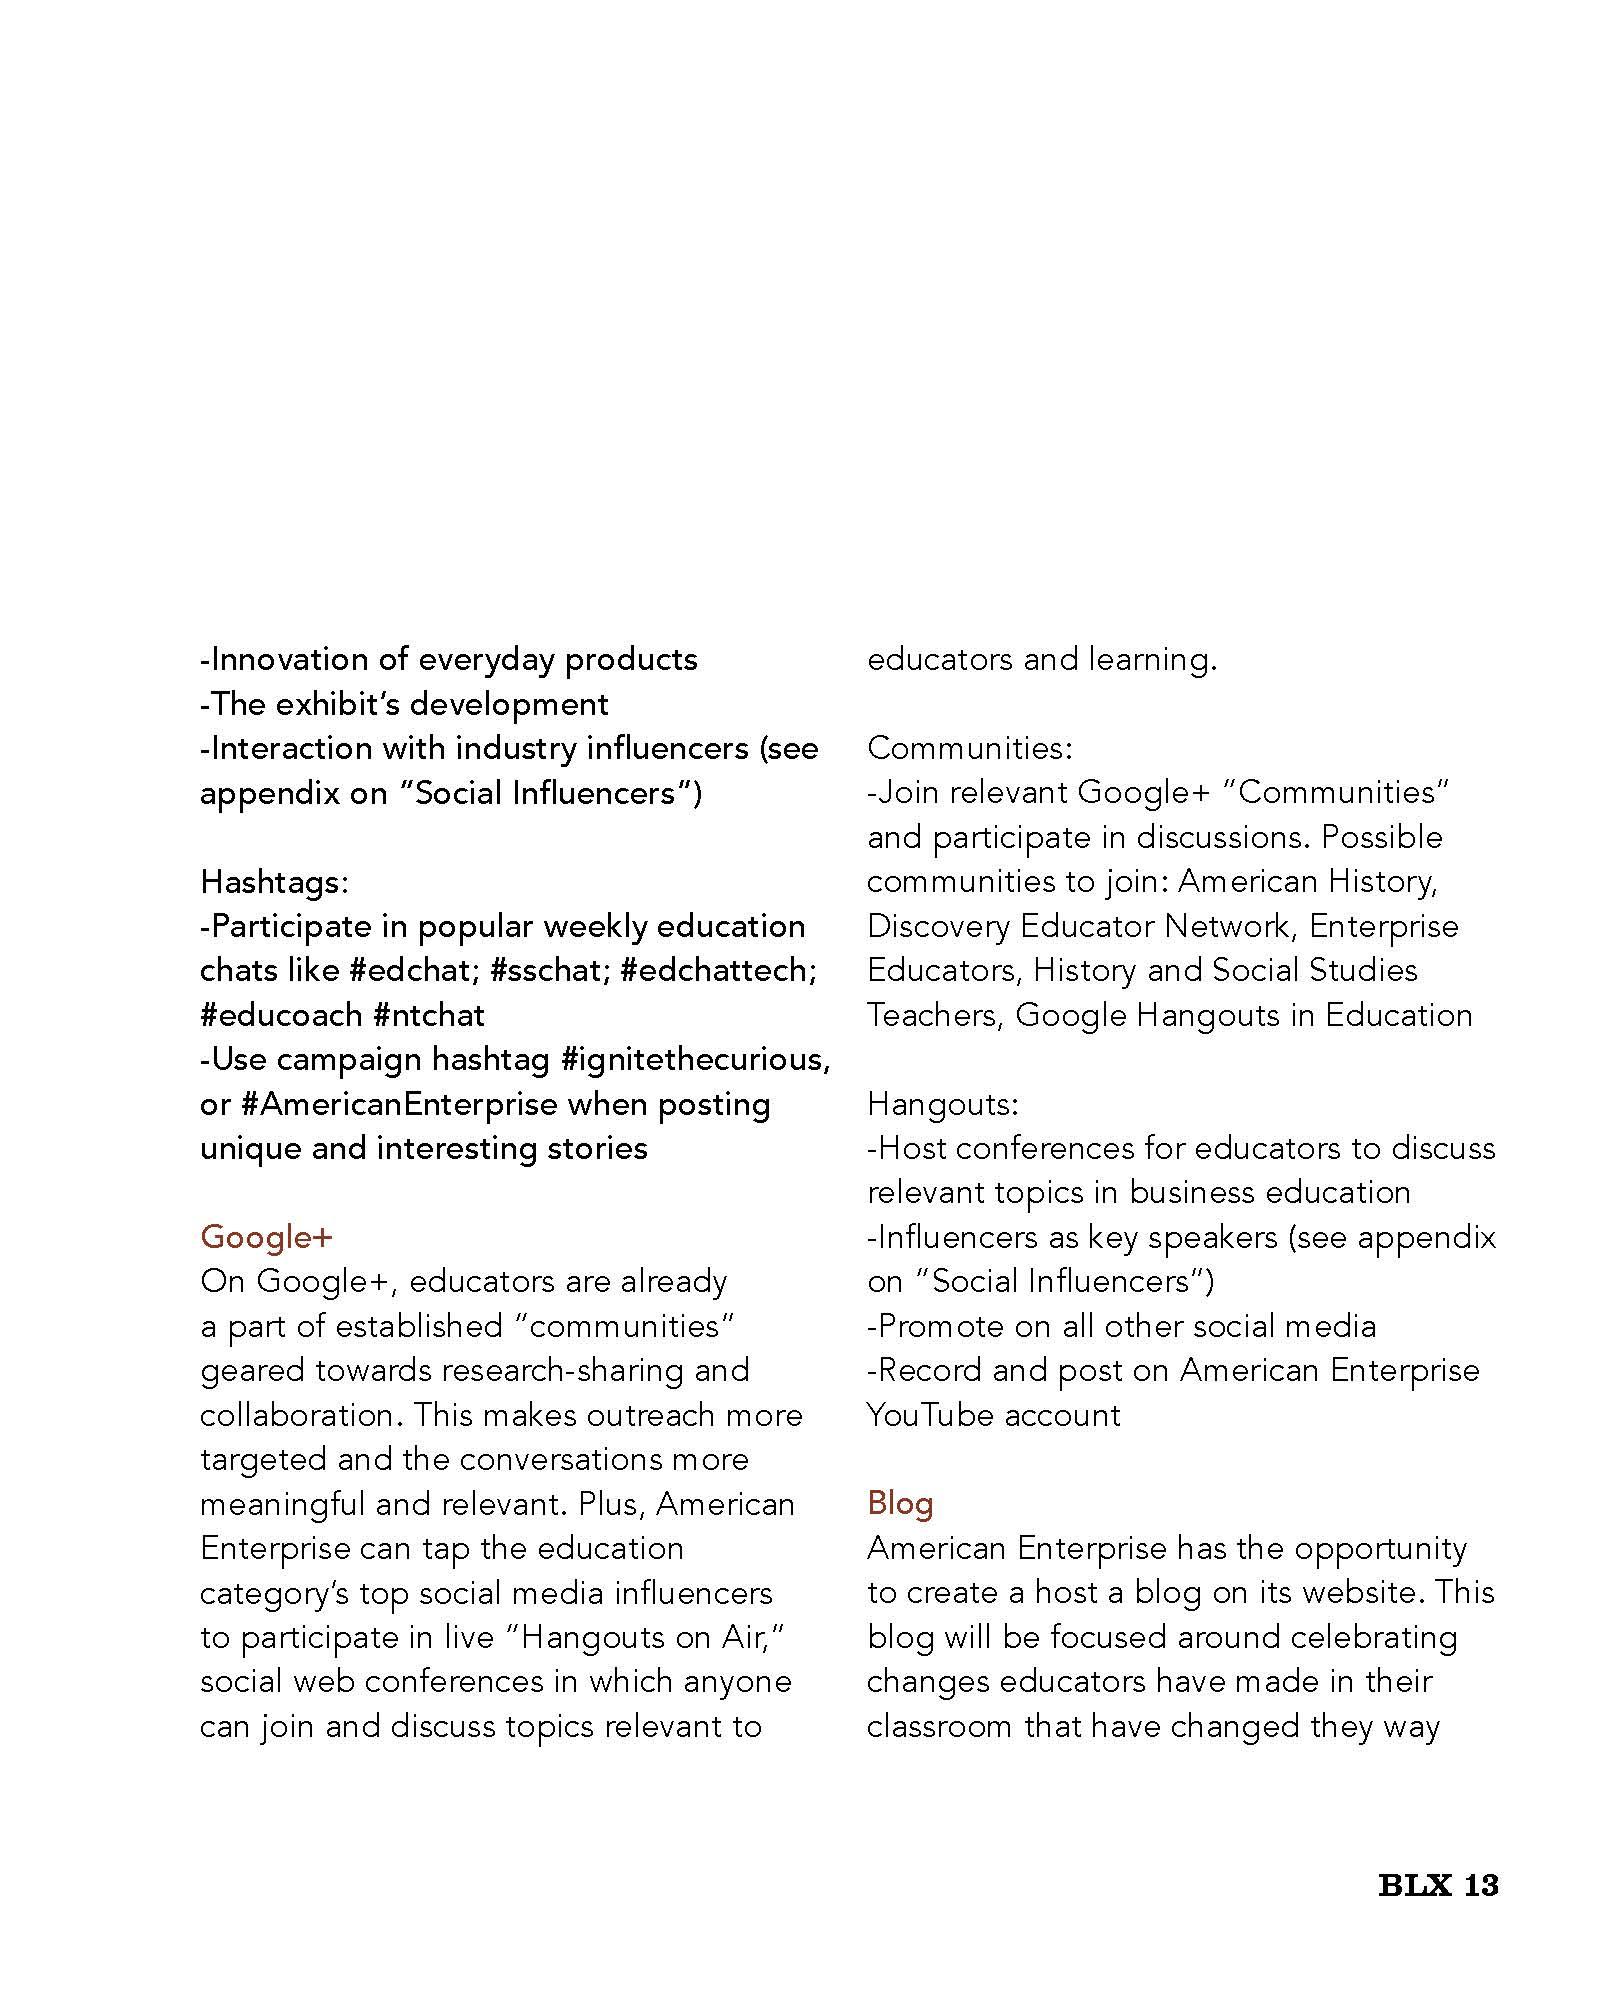 American Enterprise Plans Book%2C 2013%28cut%29_Page_43.jpg